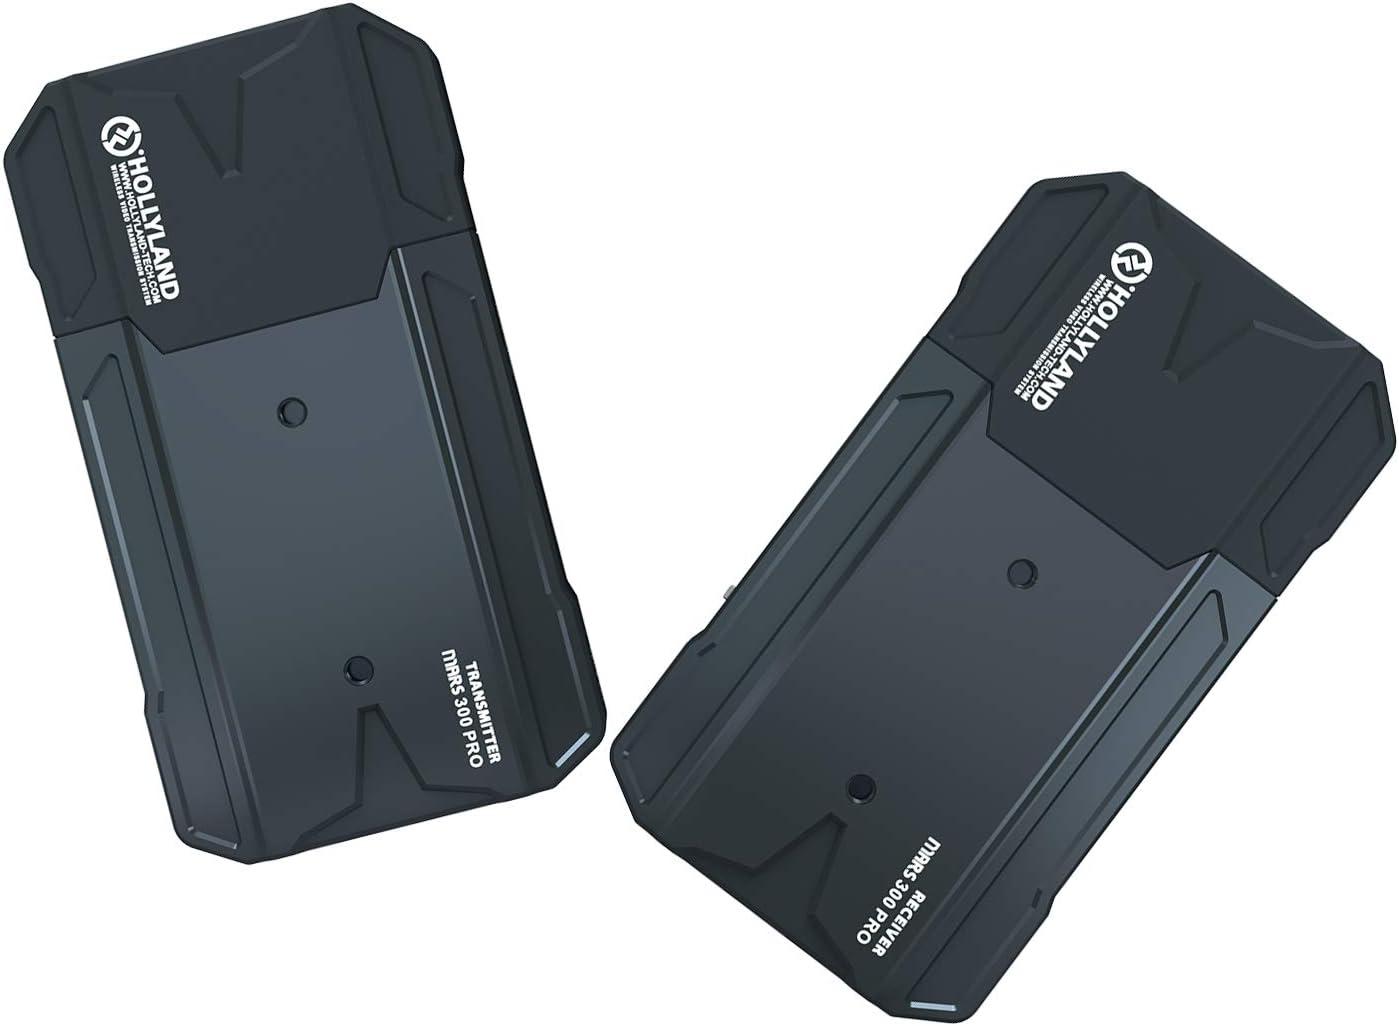 Hollyland Mars Max 43% OFF 300 Pro HDMI Bargain Audio Transmission System Video 5G